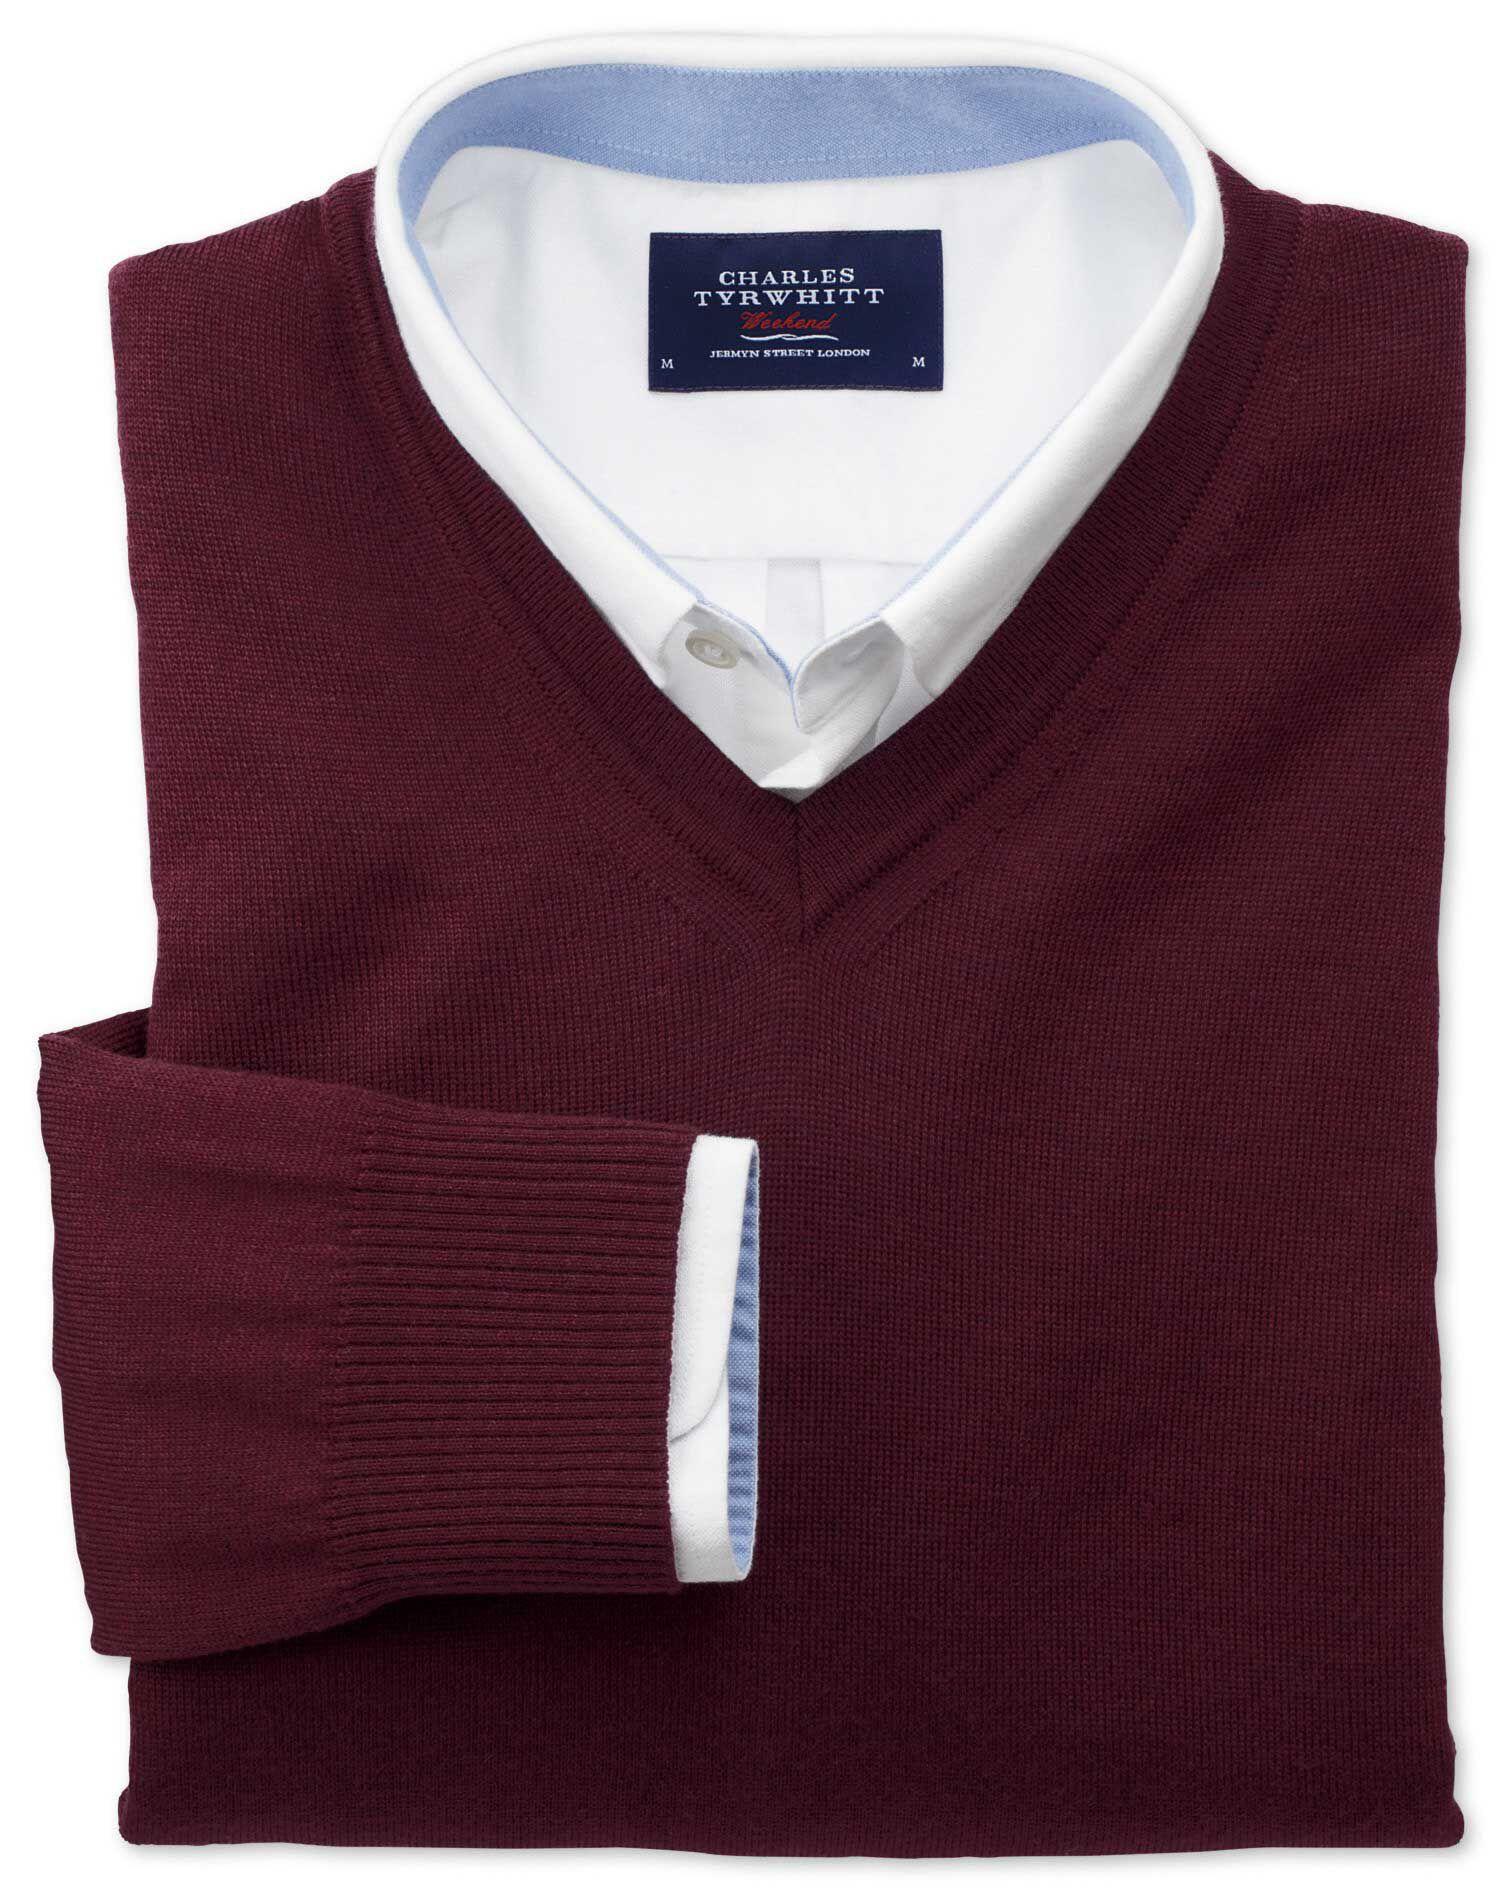 Wine Merino Wool V-Neck Jumper Size XL by Charles Tyrwhitt